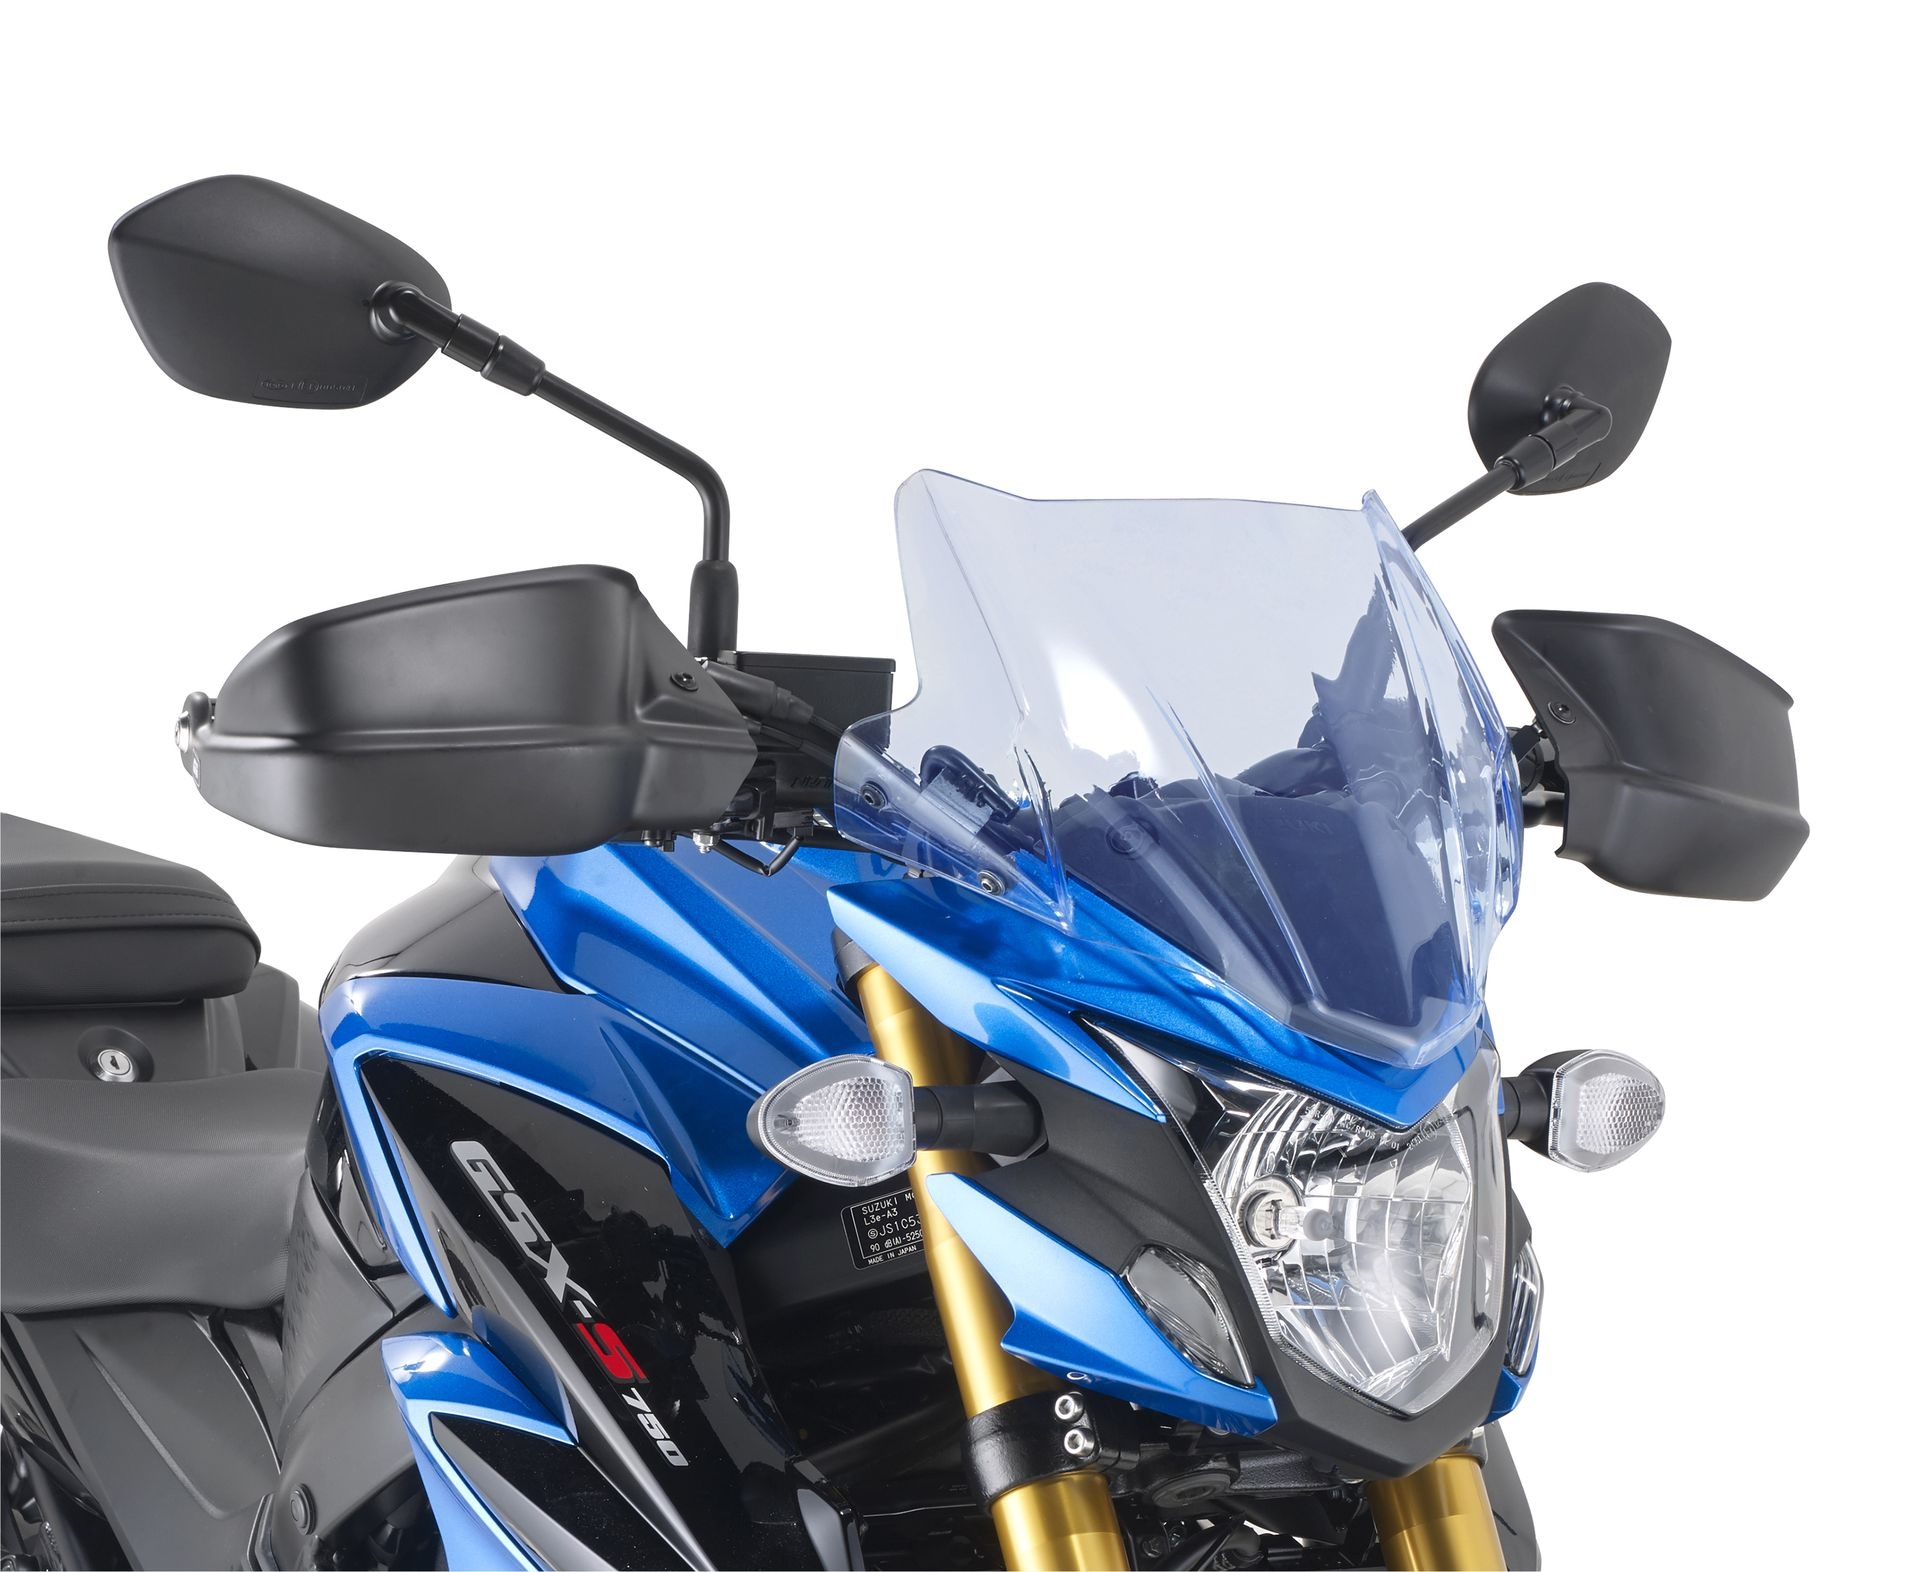 Protège-mains Givi Suzuki 750 GSX-S 2017